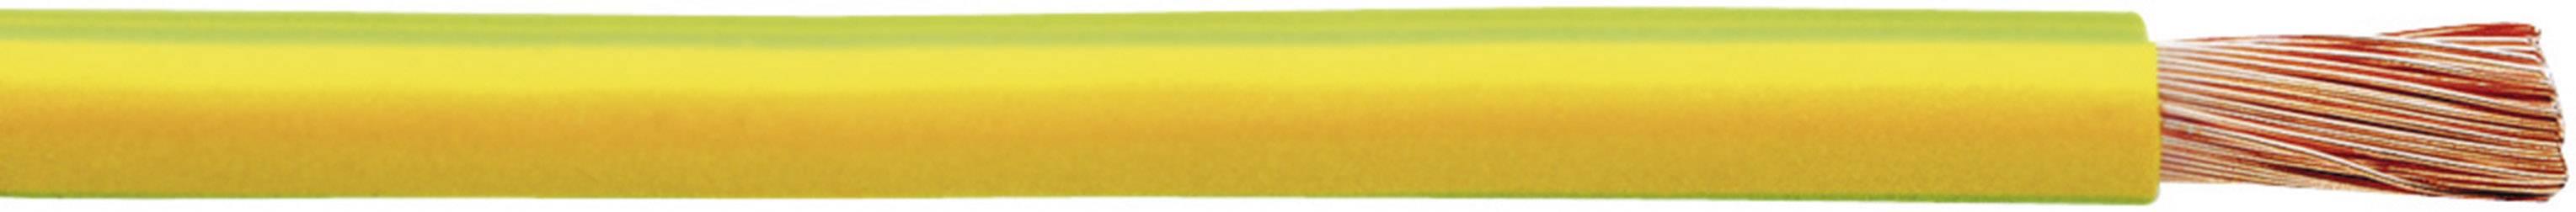 Opletenie / lanko Faber Kabel 040052 H07V-K, 1 x 2.50 mm², vonkajší Ø 3.40 mm, 100 m, hnedá